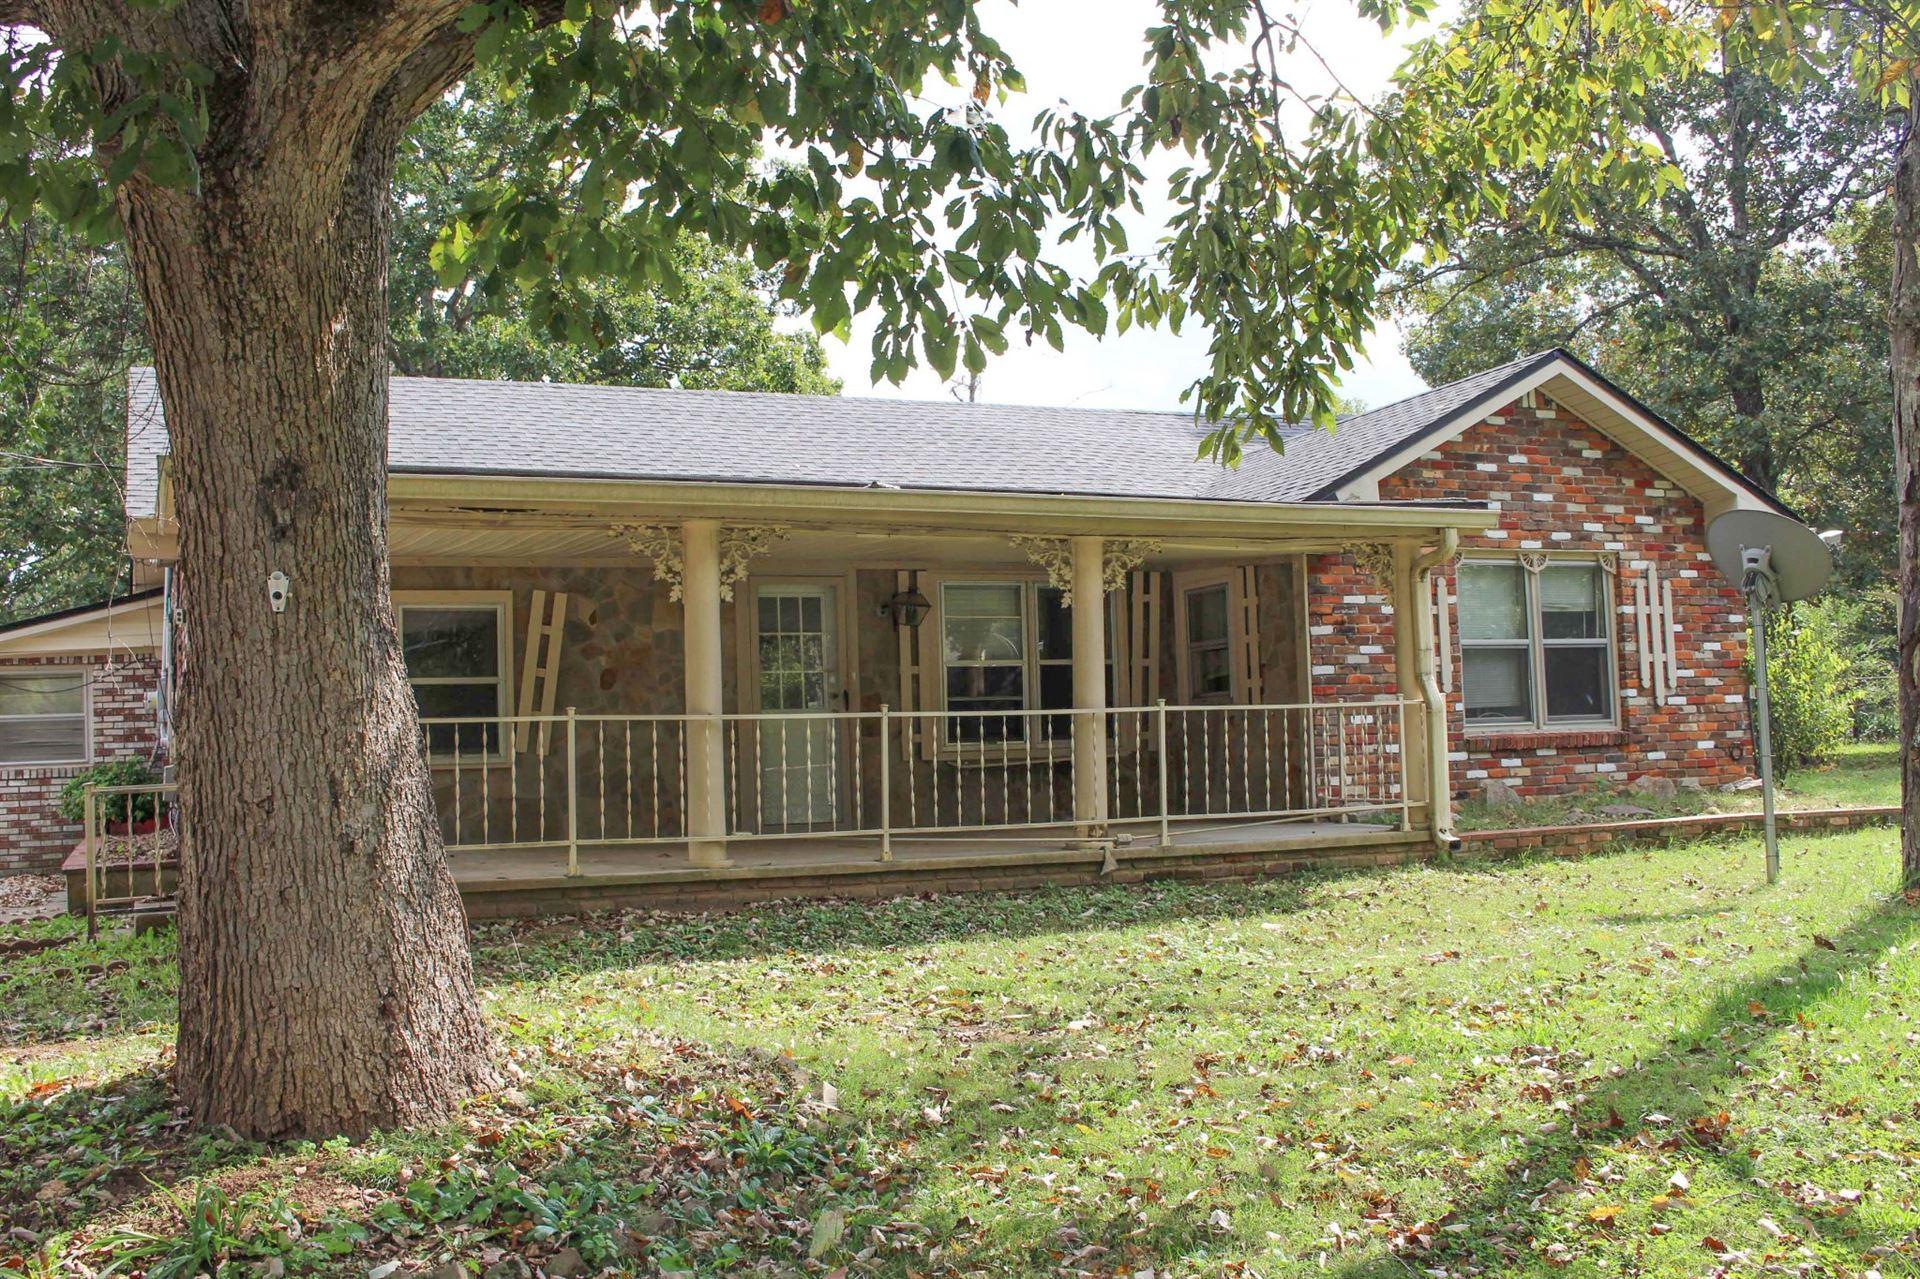 409 Mount Herman Rd, Murfreesboro, TN 37127 - MLS#: 2300449